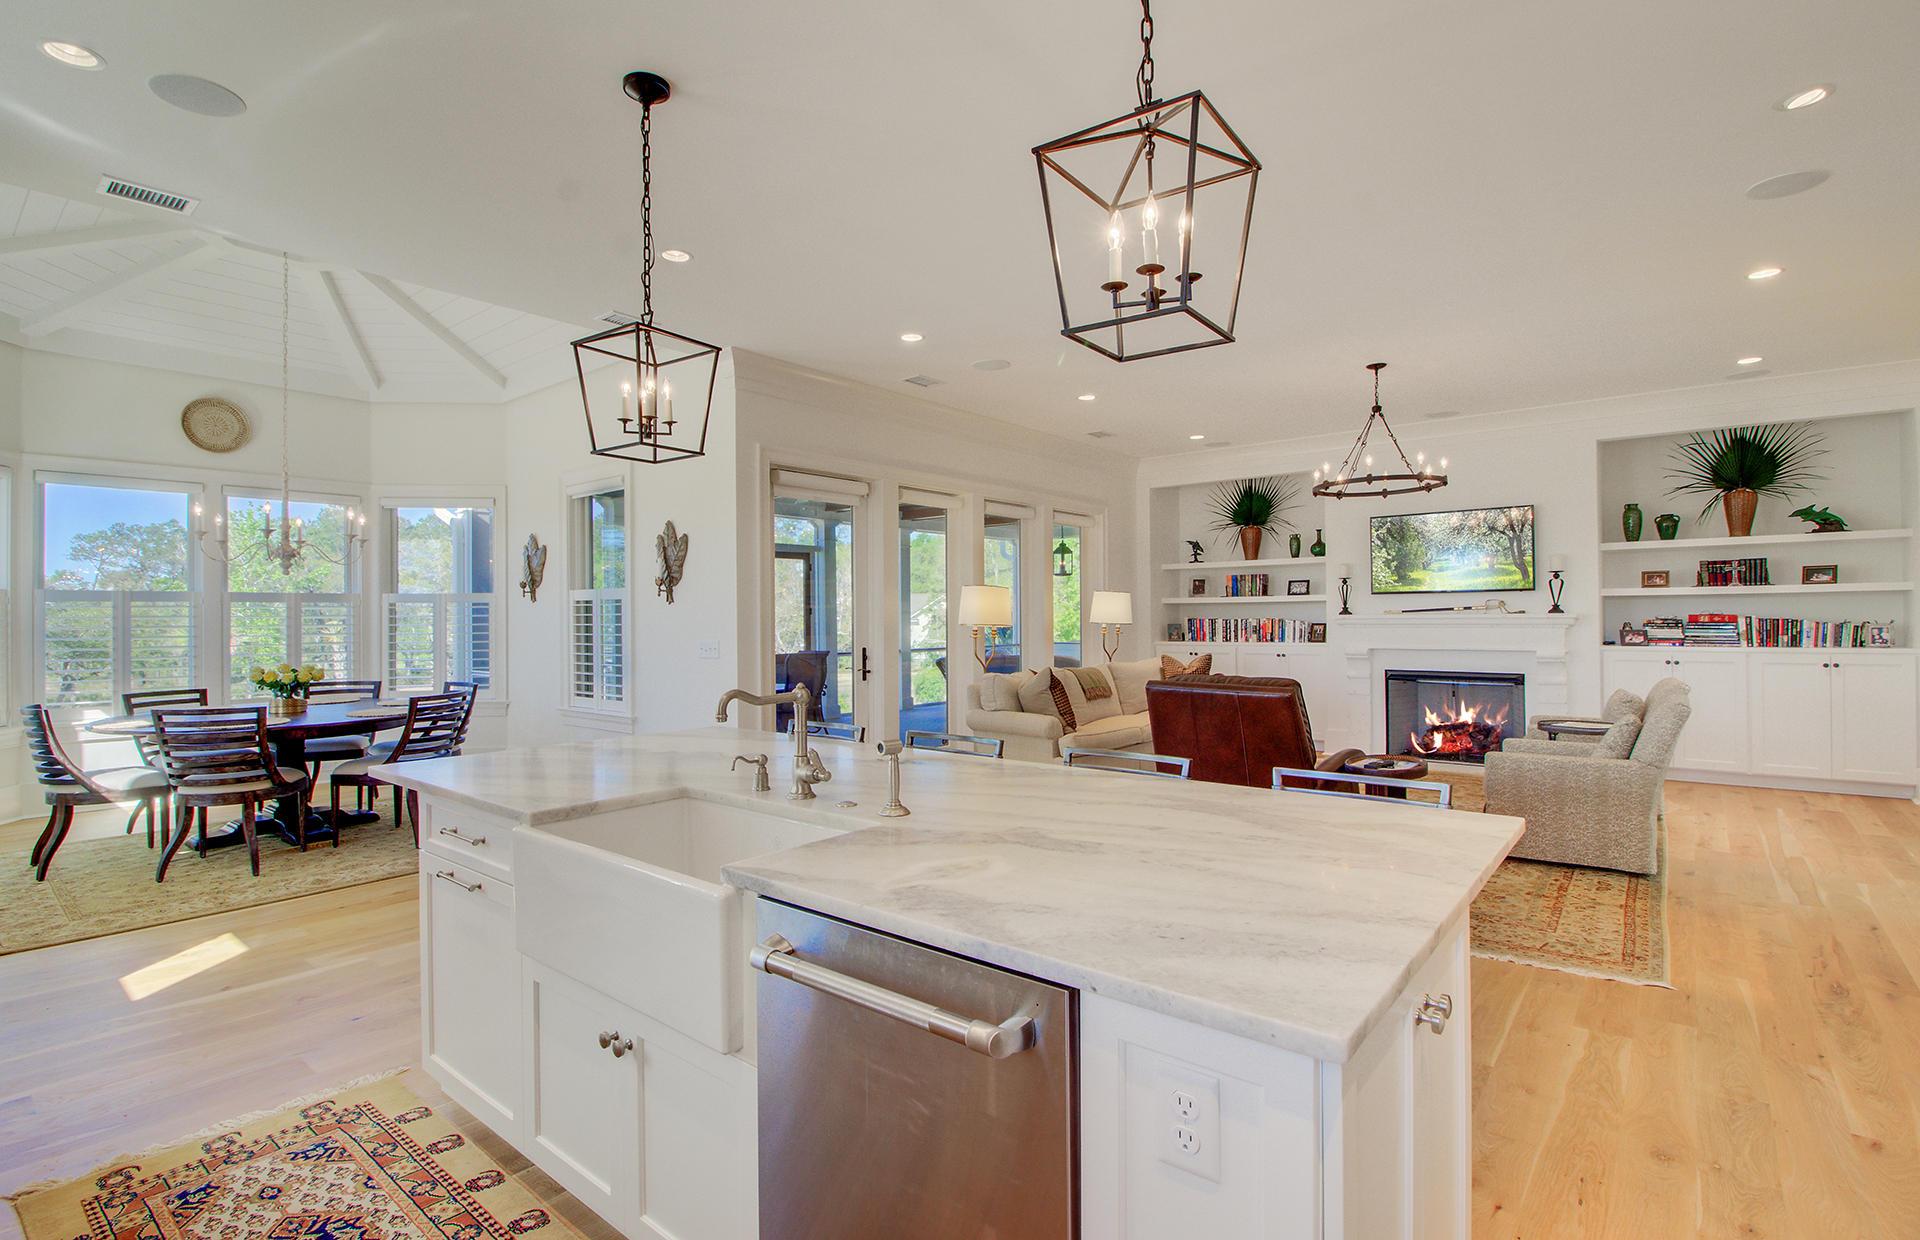 Beresford Hall Homes For Sale - 253 Grand Park, Charleston, SC - 5